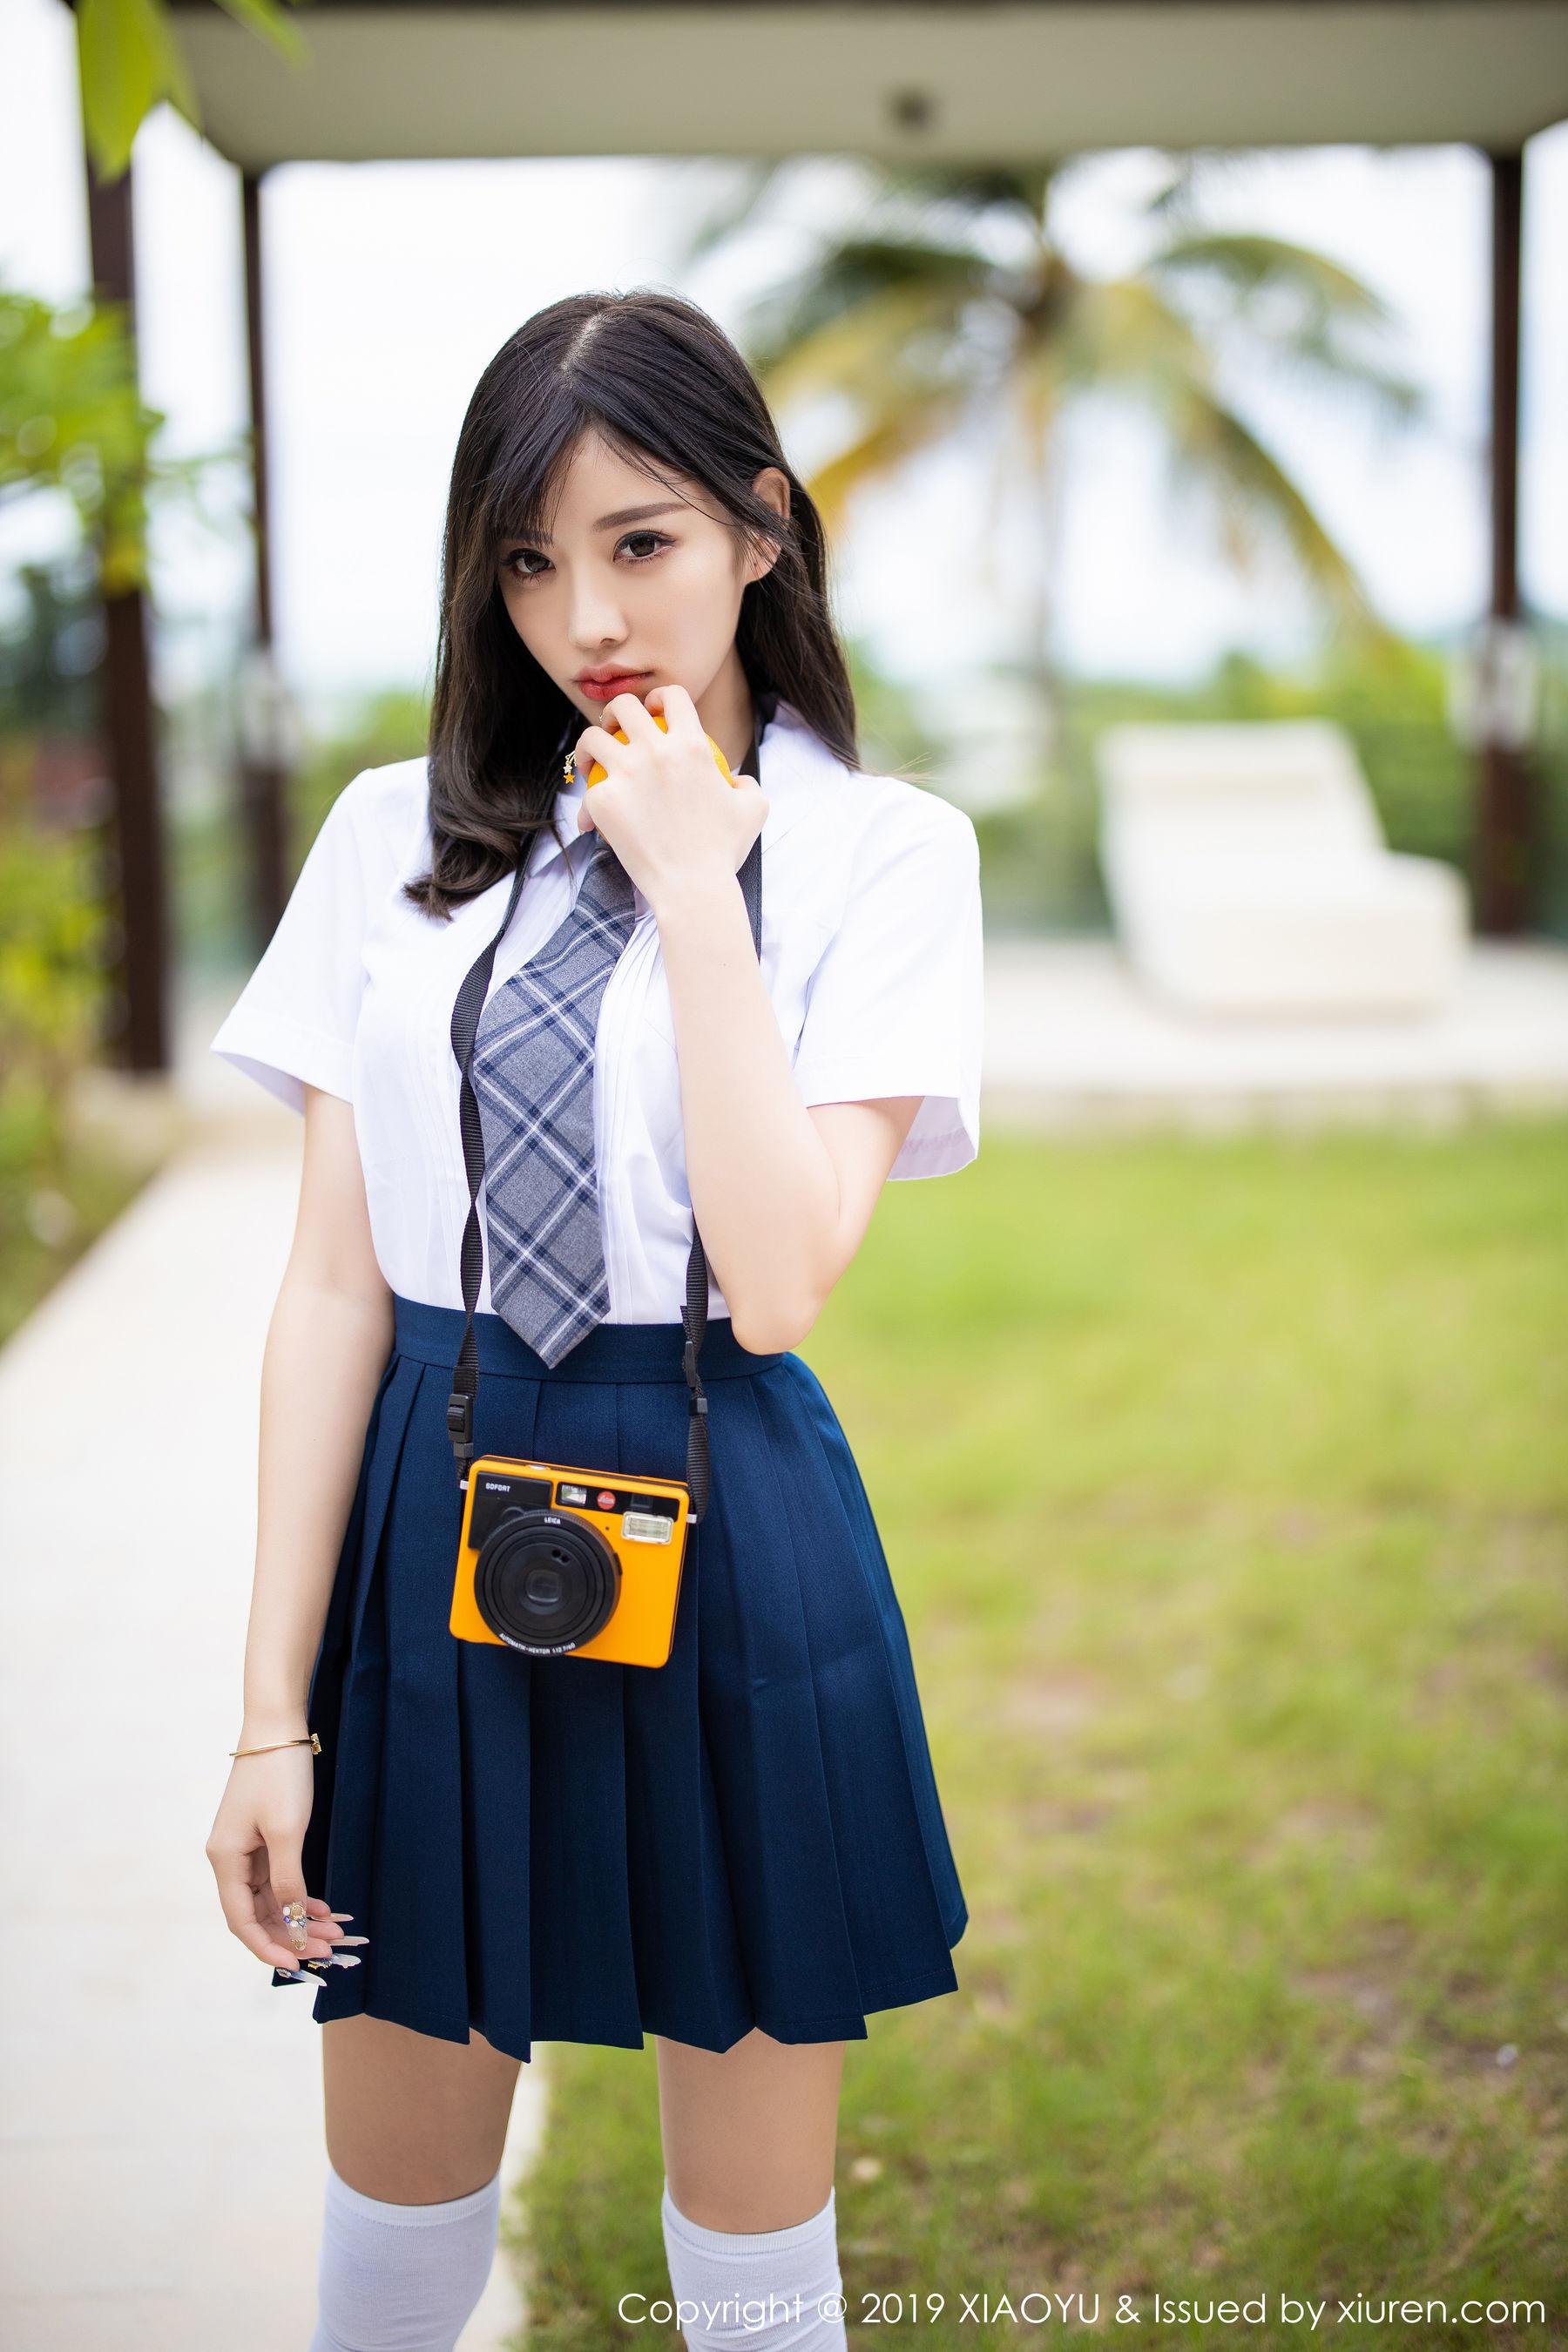 uniformc004